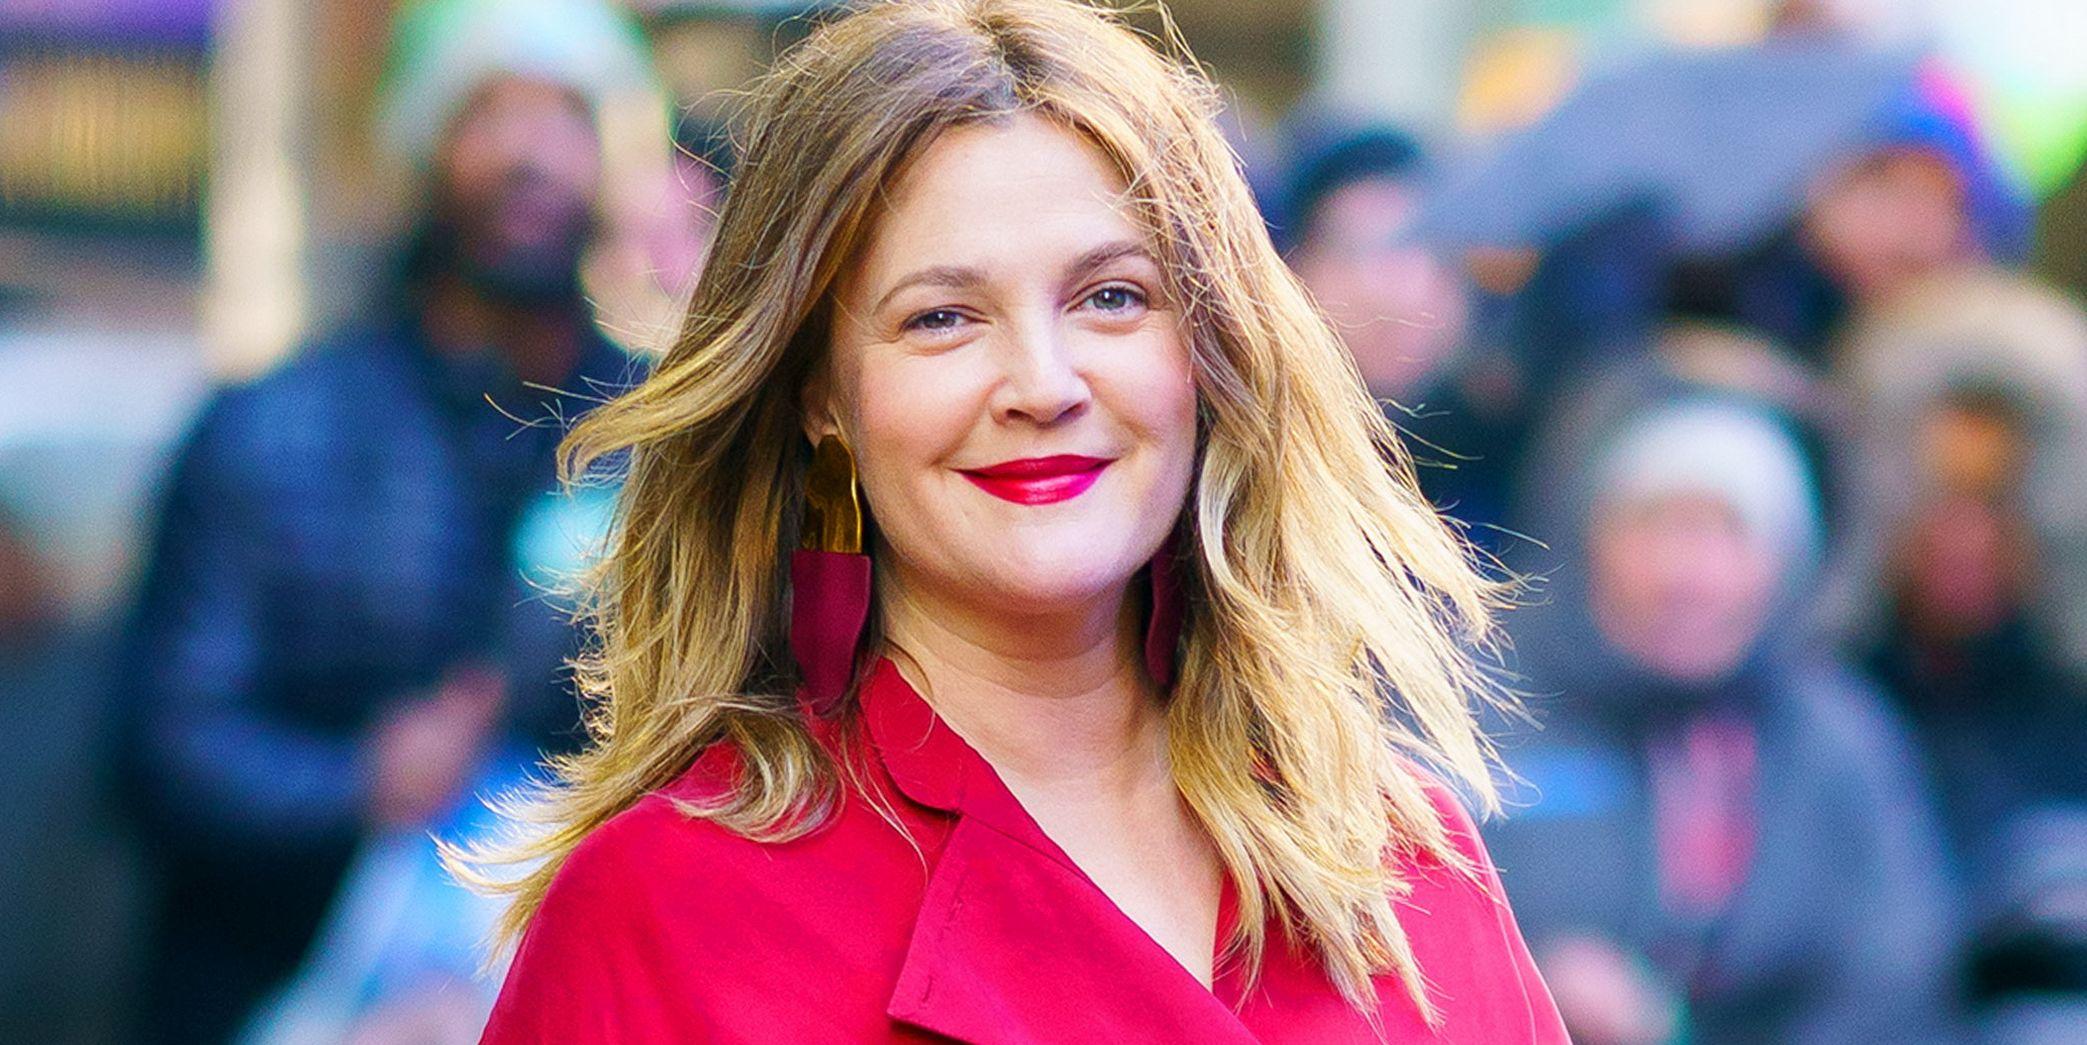 Celebrity Sightings In New York City - April 01, 2019